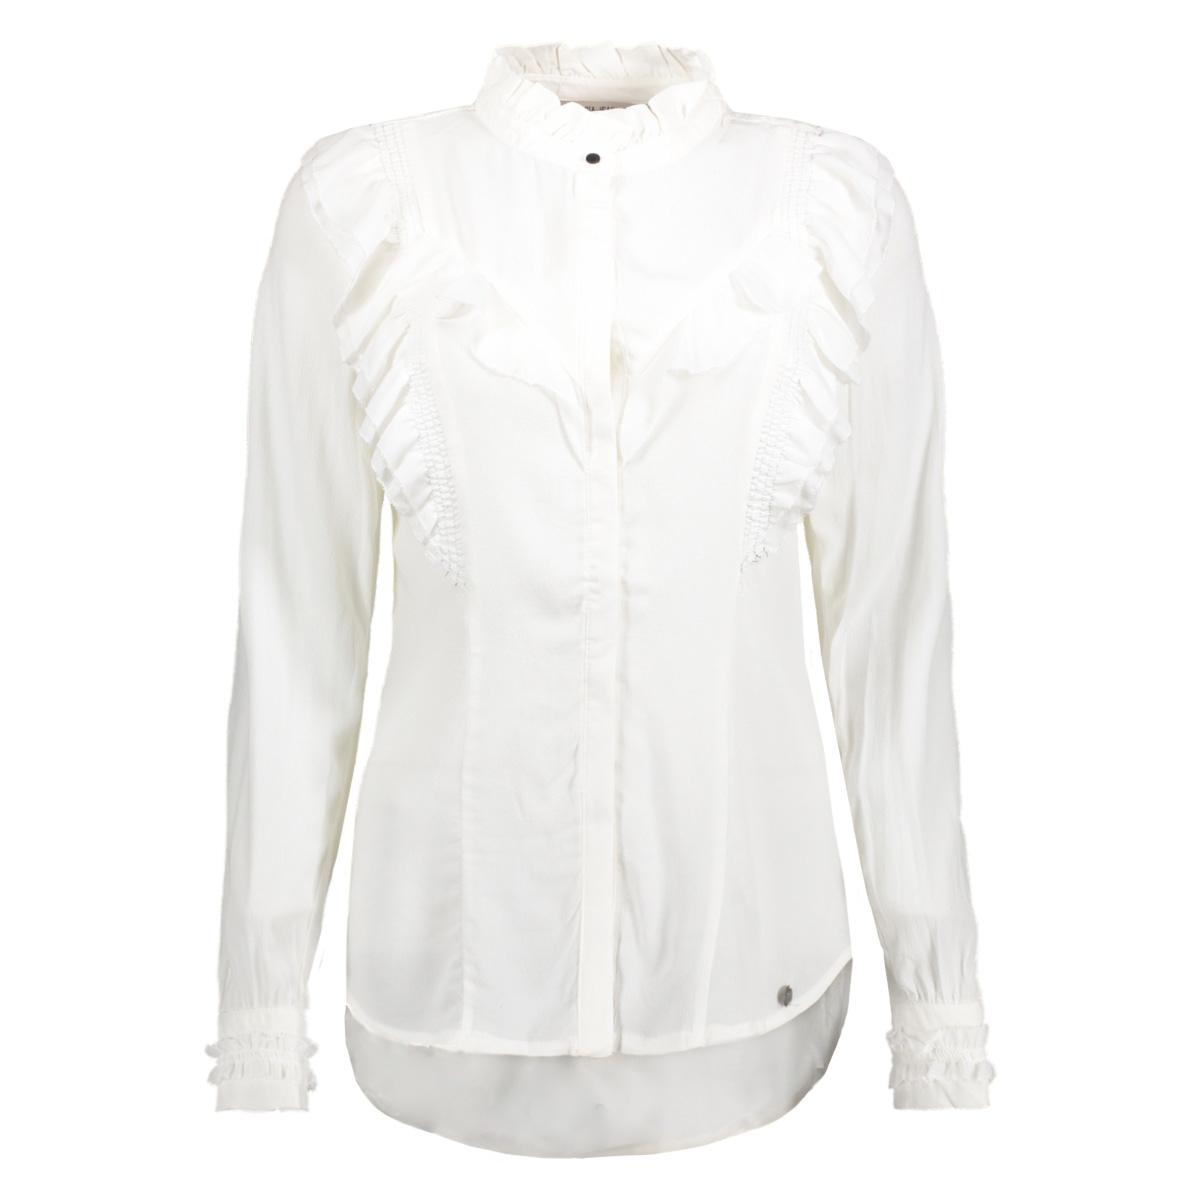 j70231 garcia blouse 53 off white